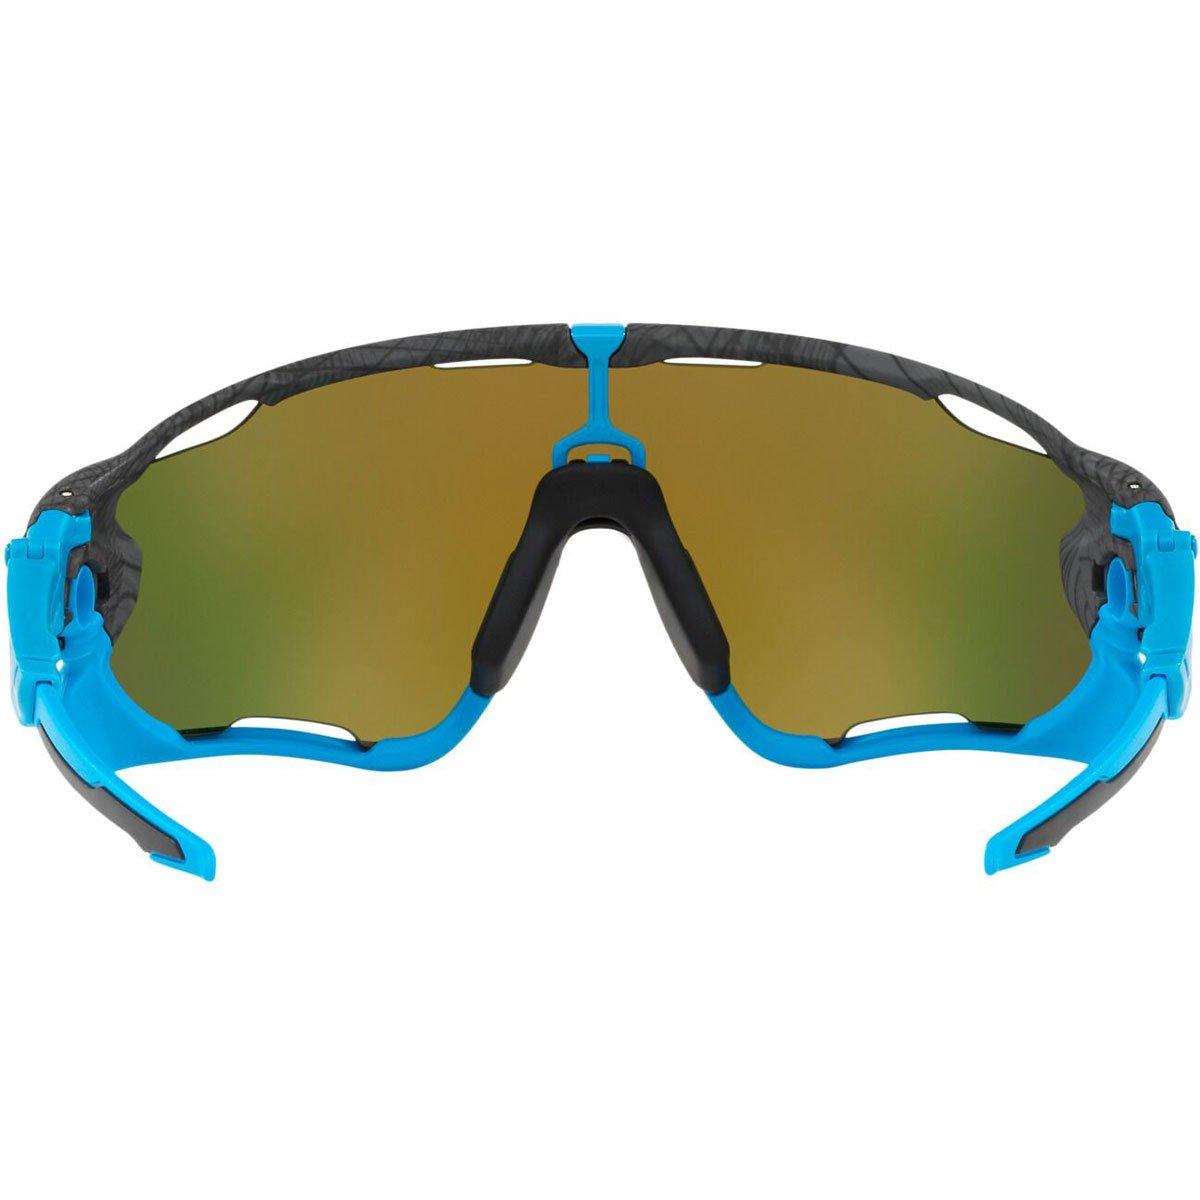 80ba144b3 Amazon.com: Oakley Men's Jawbreaker Non-Polarized Iridium Rectangular  Sunglasses, AERO GRID GREY, 0 mm: Clothing